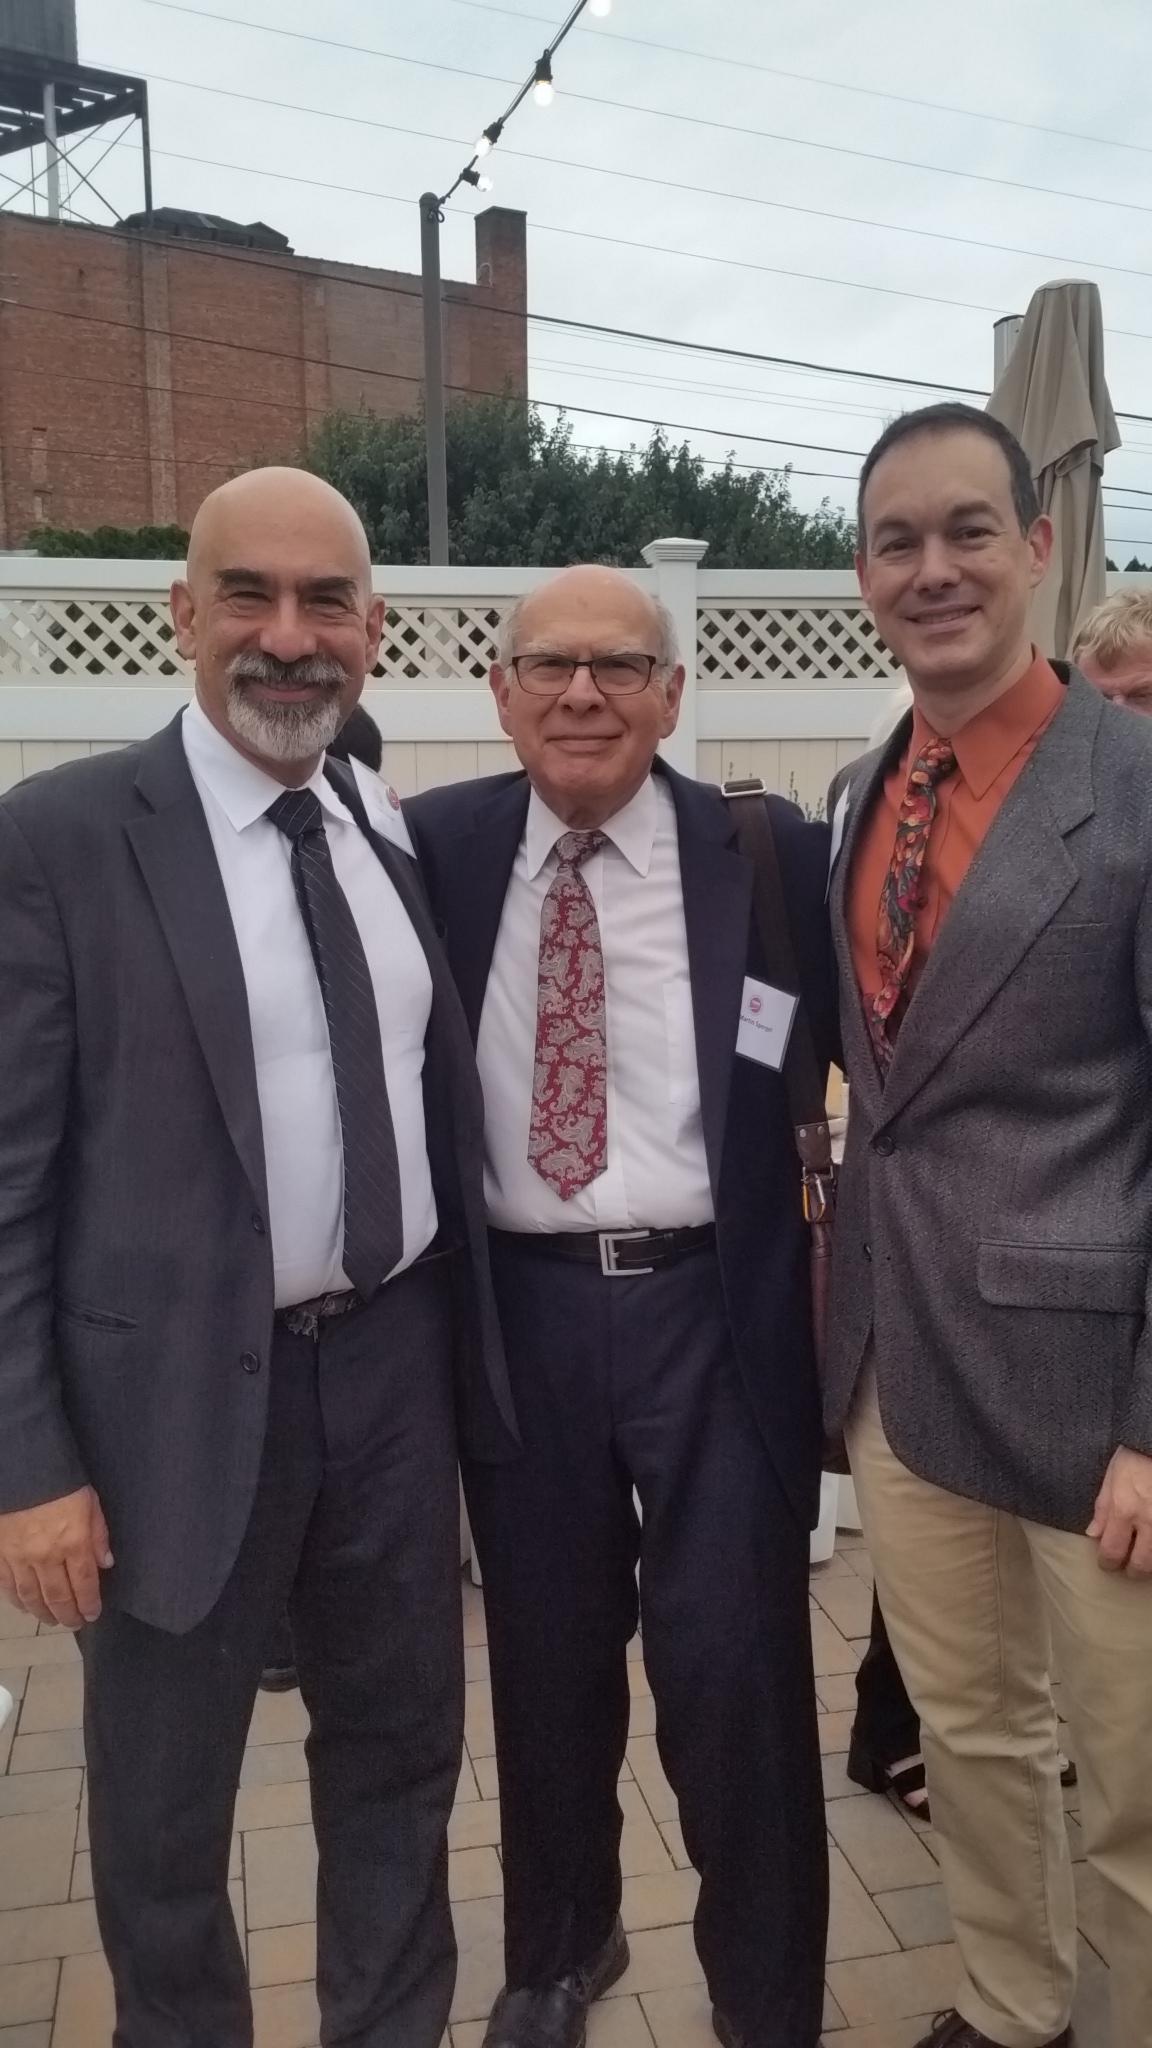 Dr. David Spergel, Dr. Martin Spergel & Dr. Tim Paglione